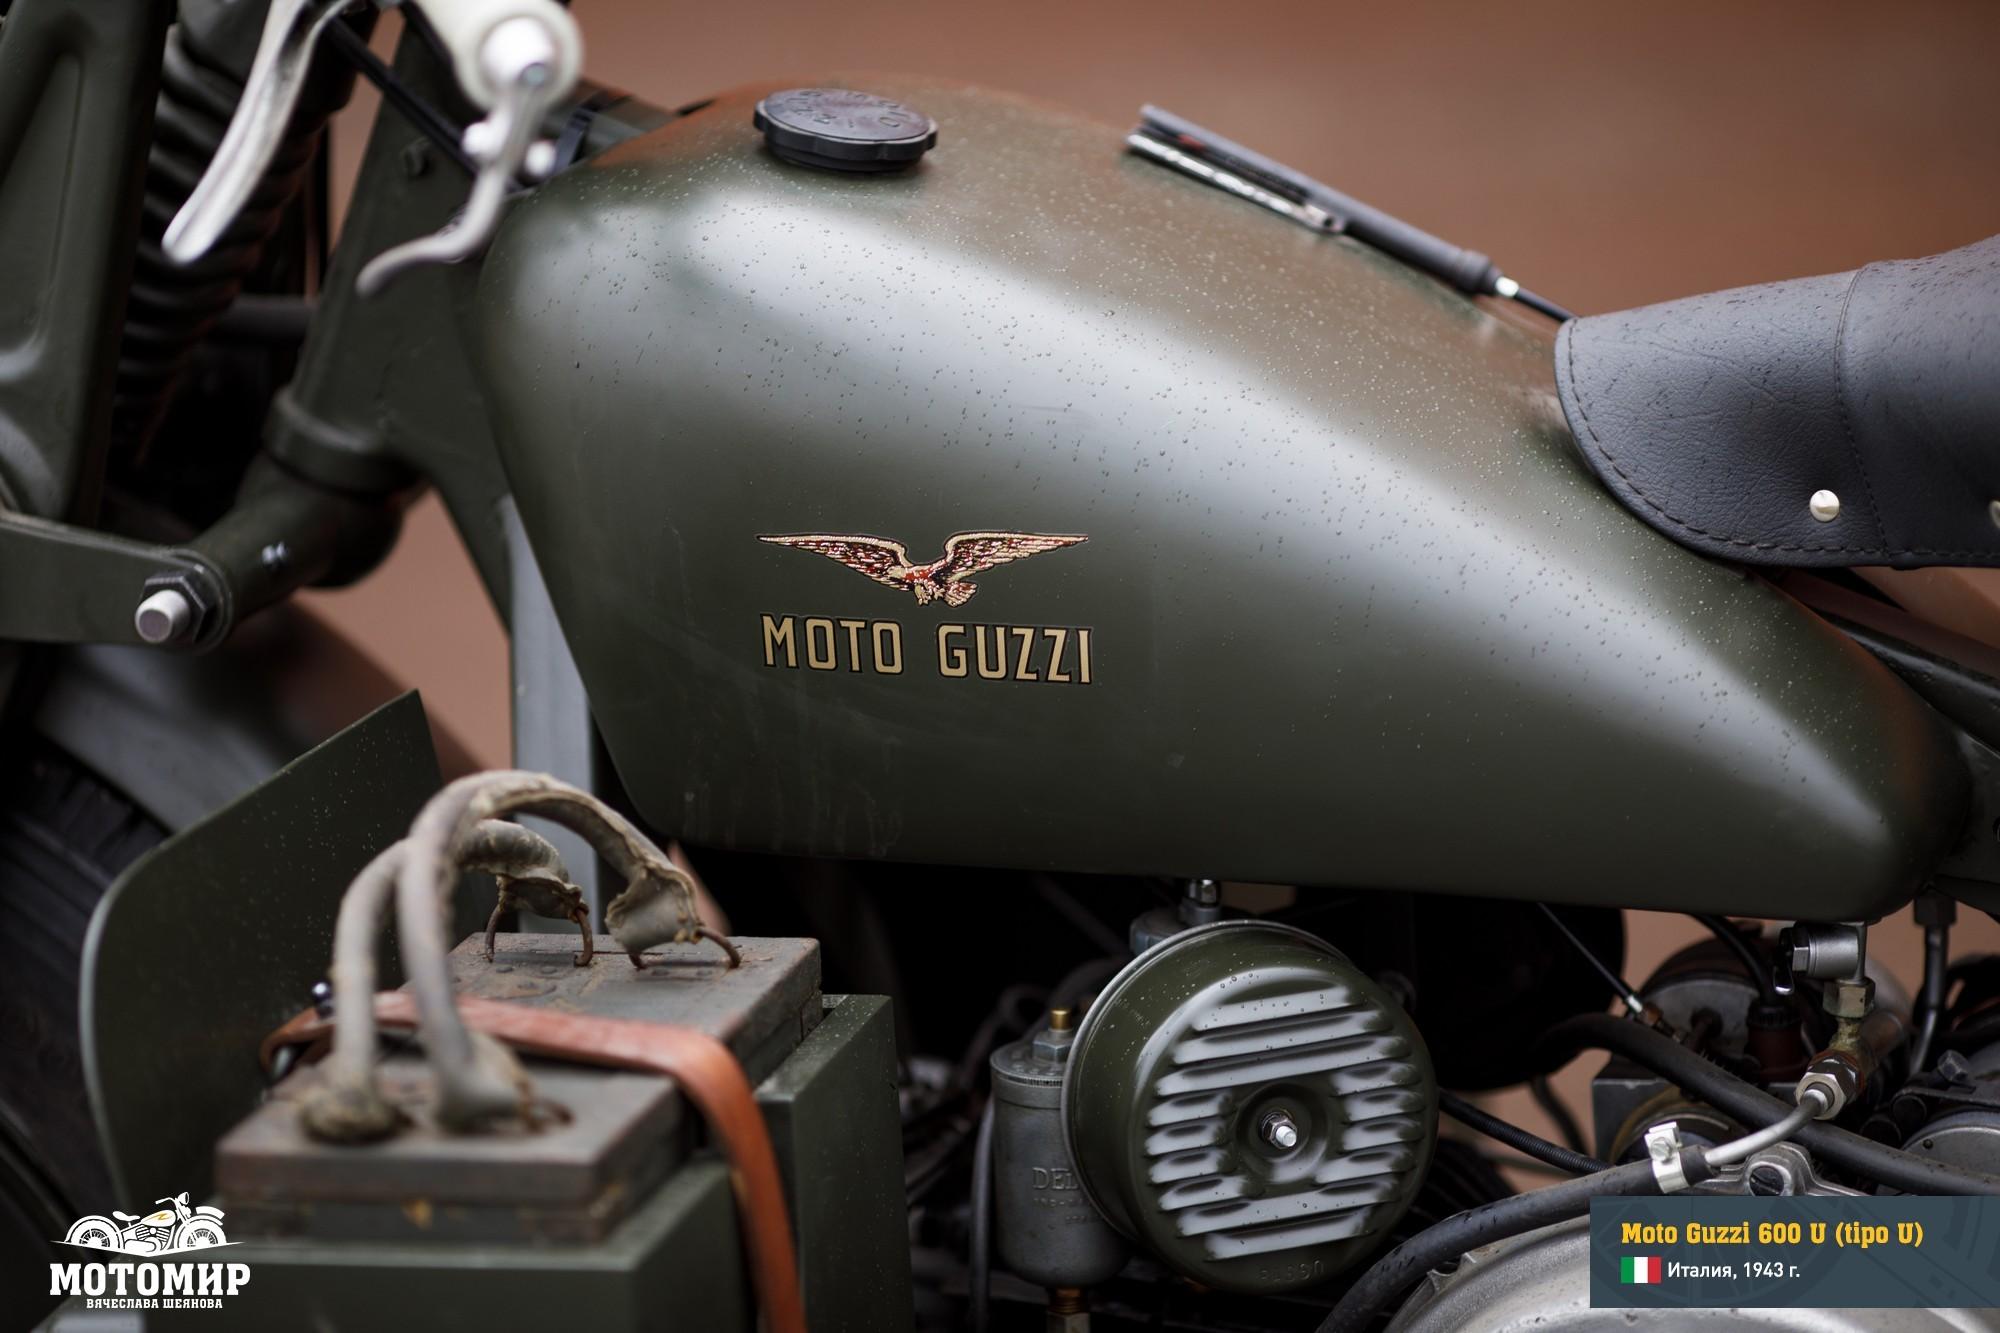 moto-guzzi-600-u-web-26